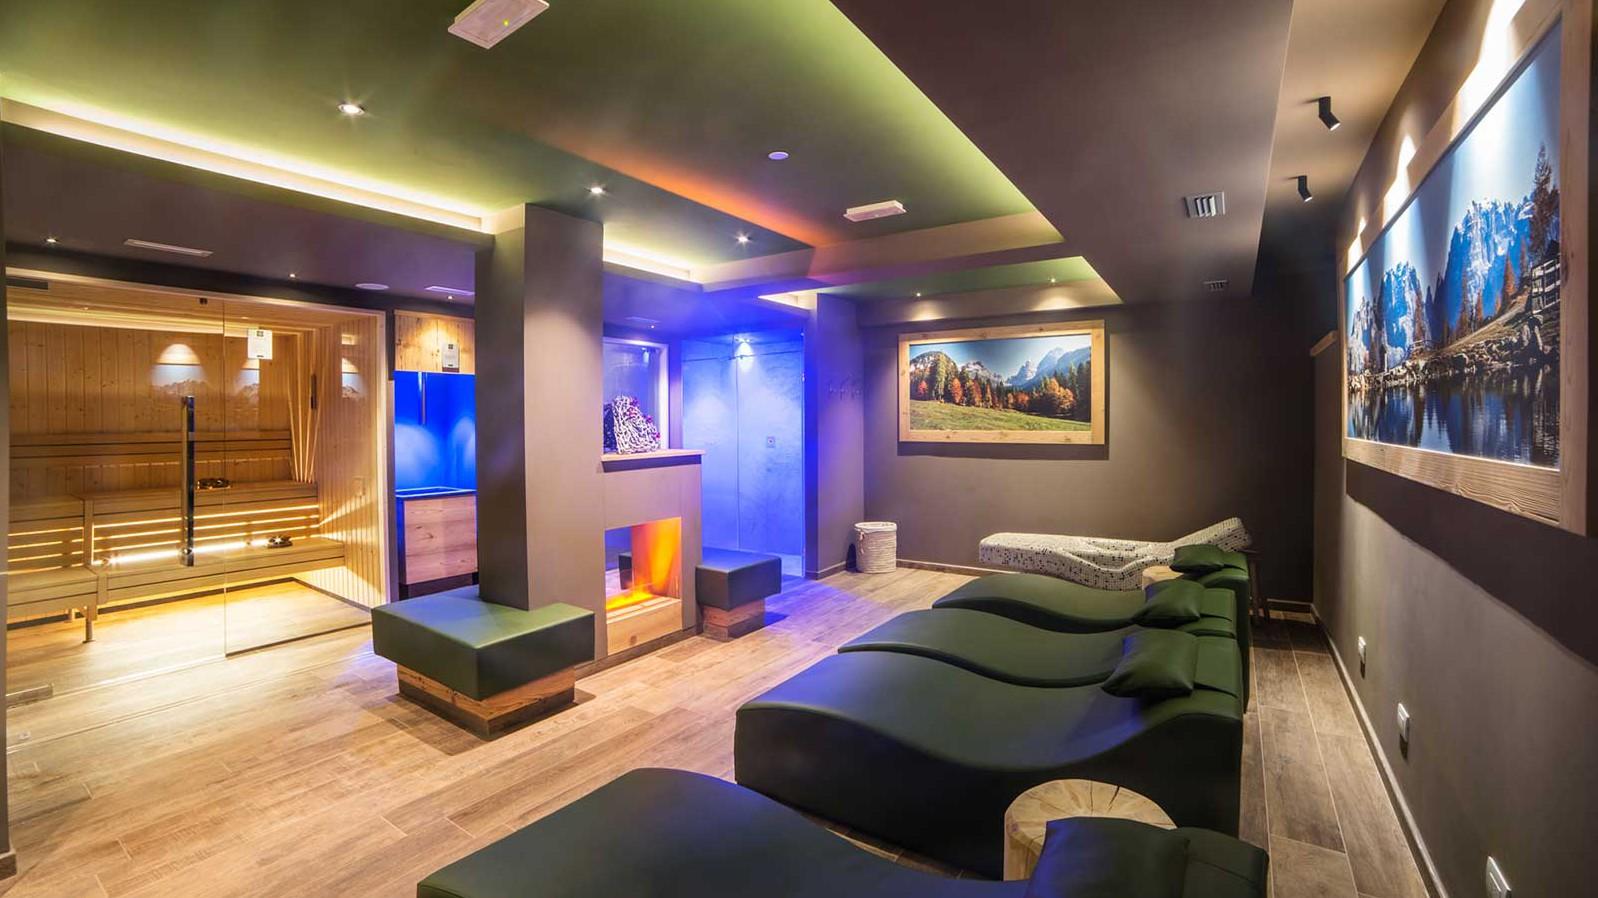 Wellness - Hotel Cime d'Oro, Madonna di Campiglio